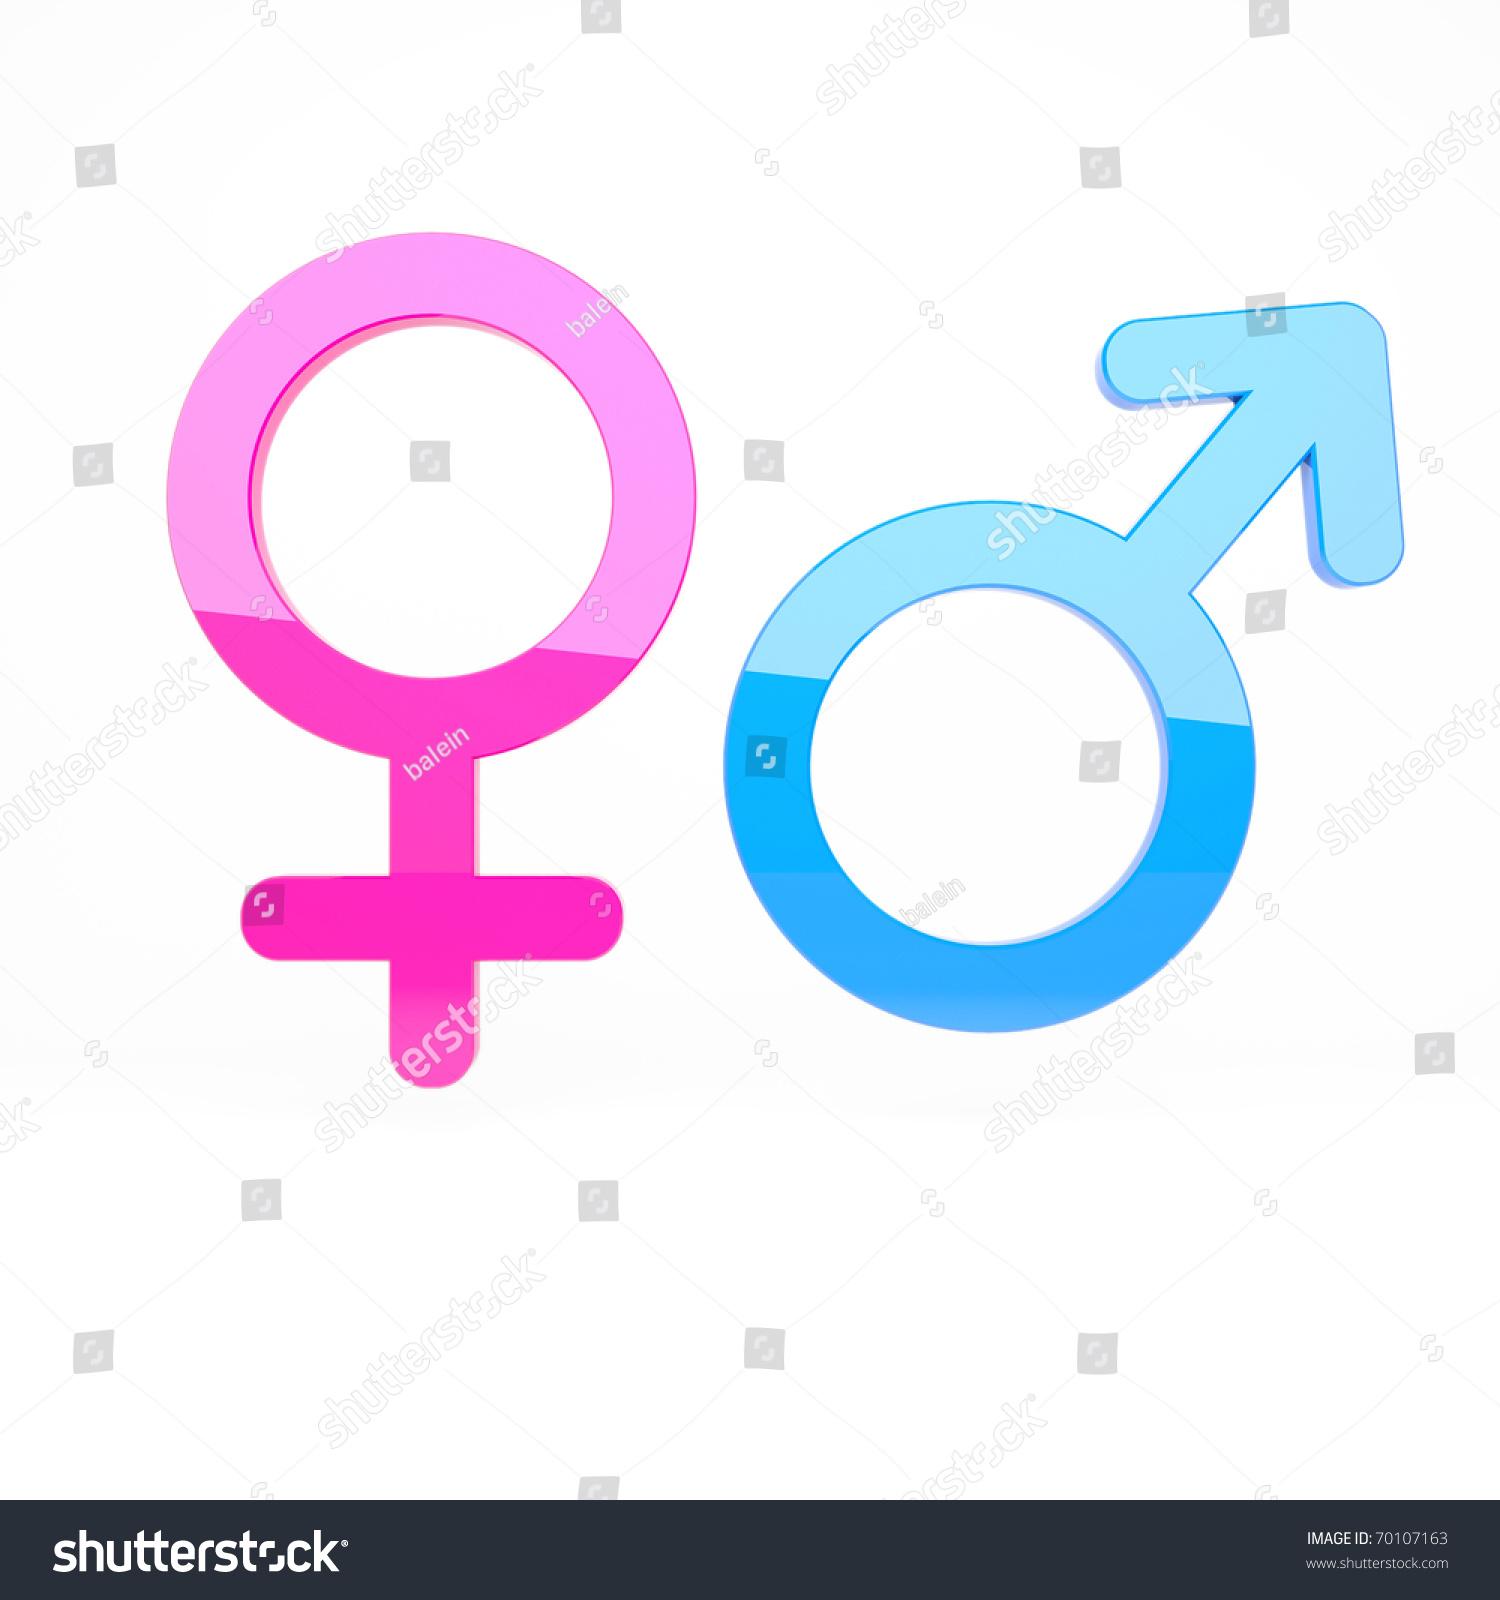 male female signs stock illustration 70107163 - shutterstock